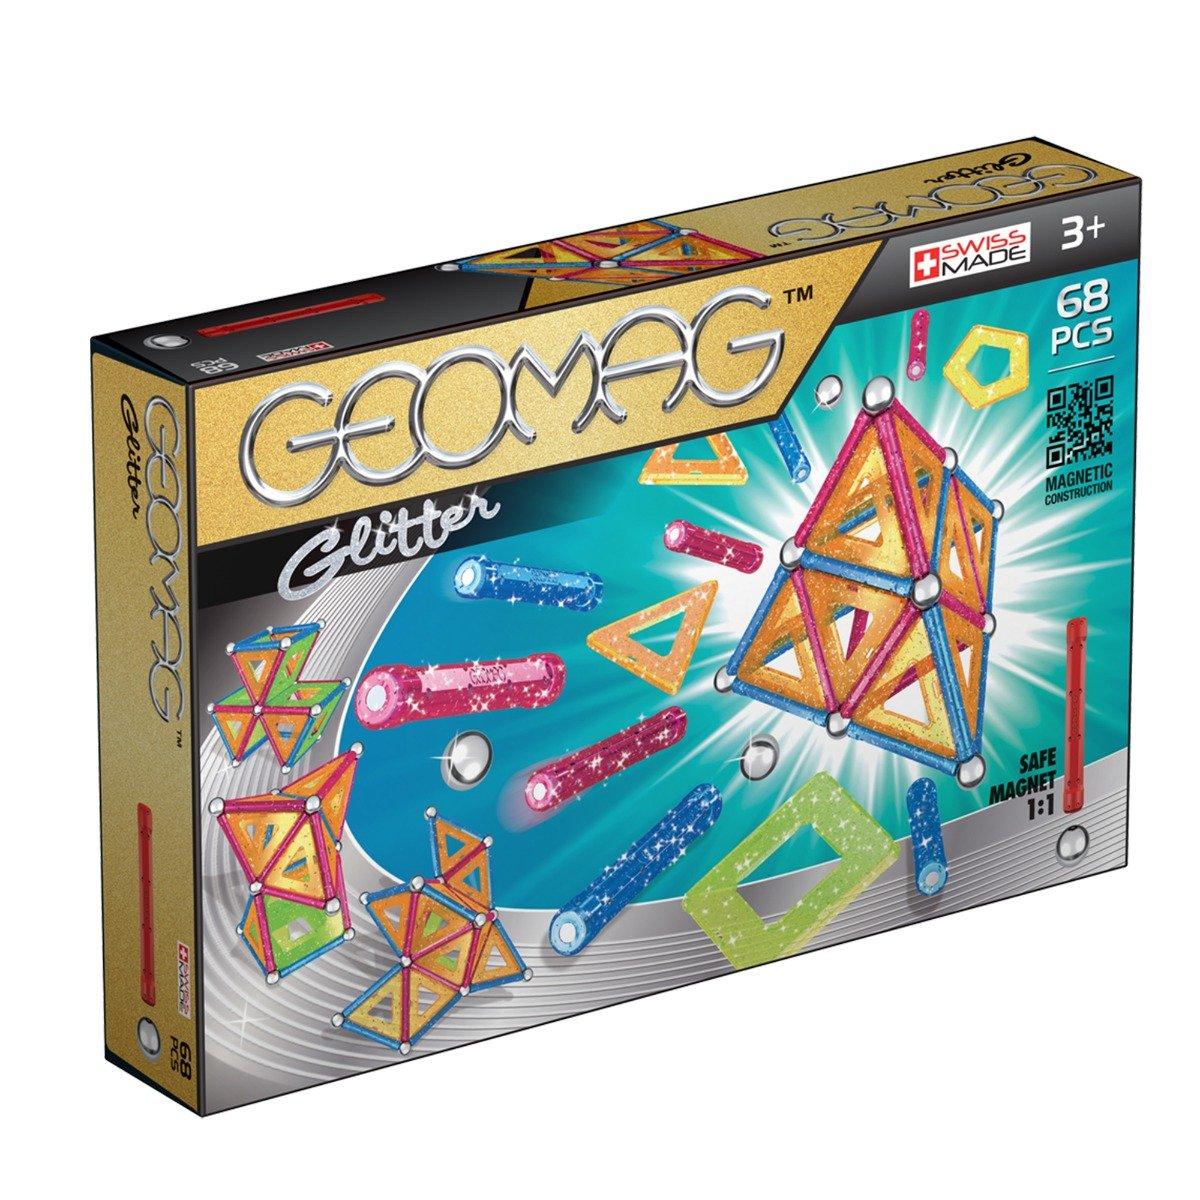 Joc de constructie magnetic Geomag Glitter, 68 piese